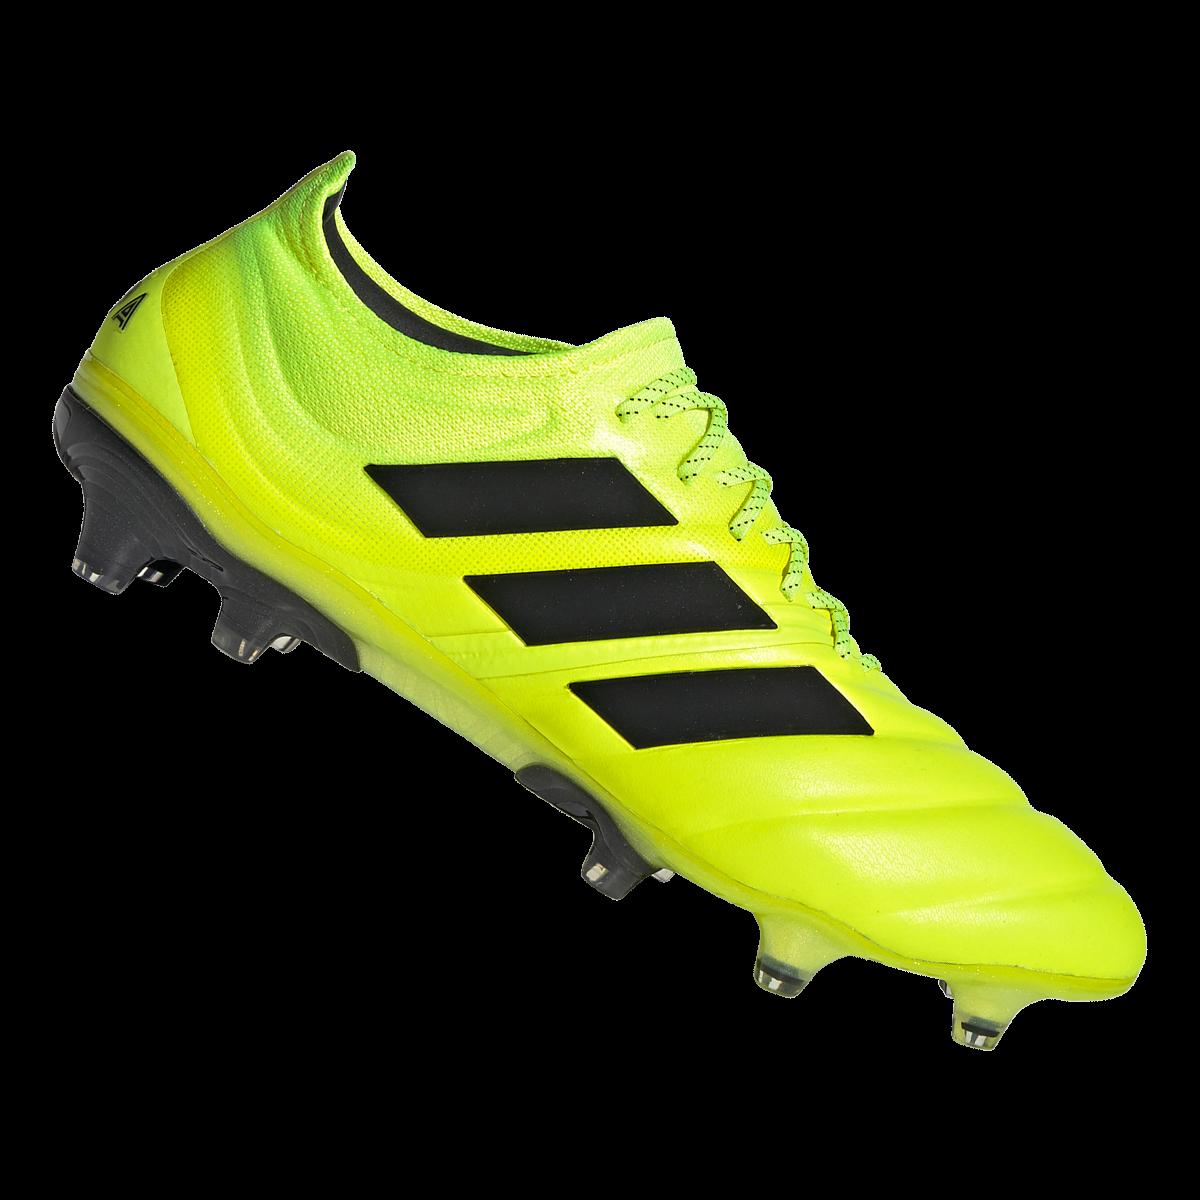 adidas Fußballschuh Copa 20.1 FG silbergelb fluo Fussball